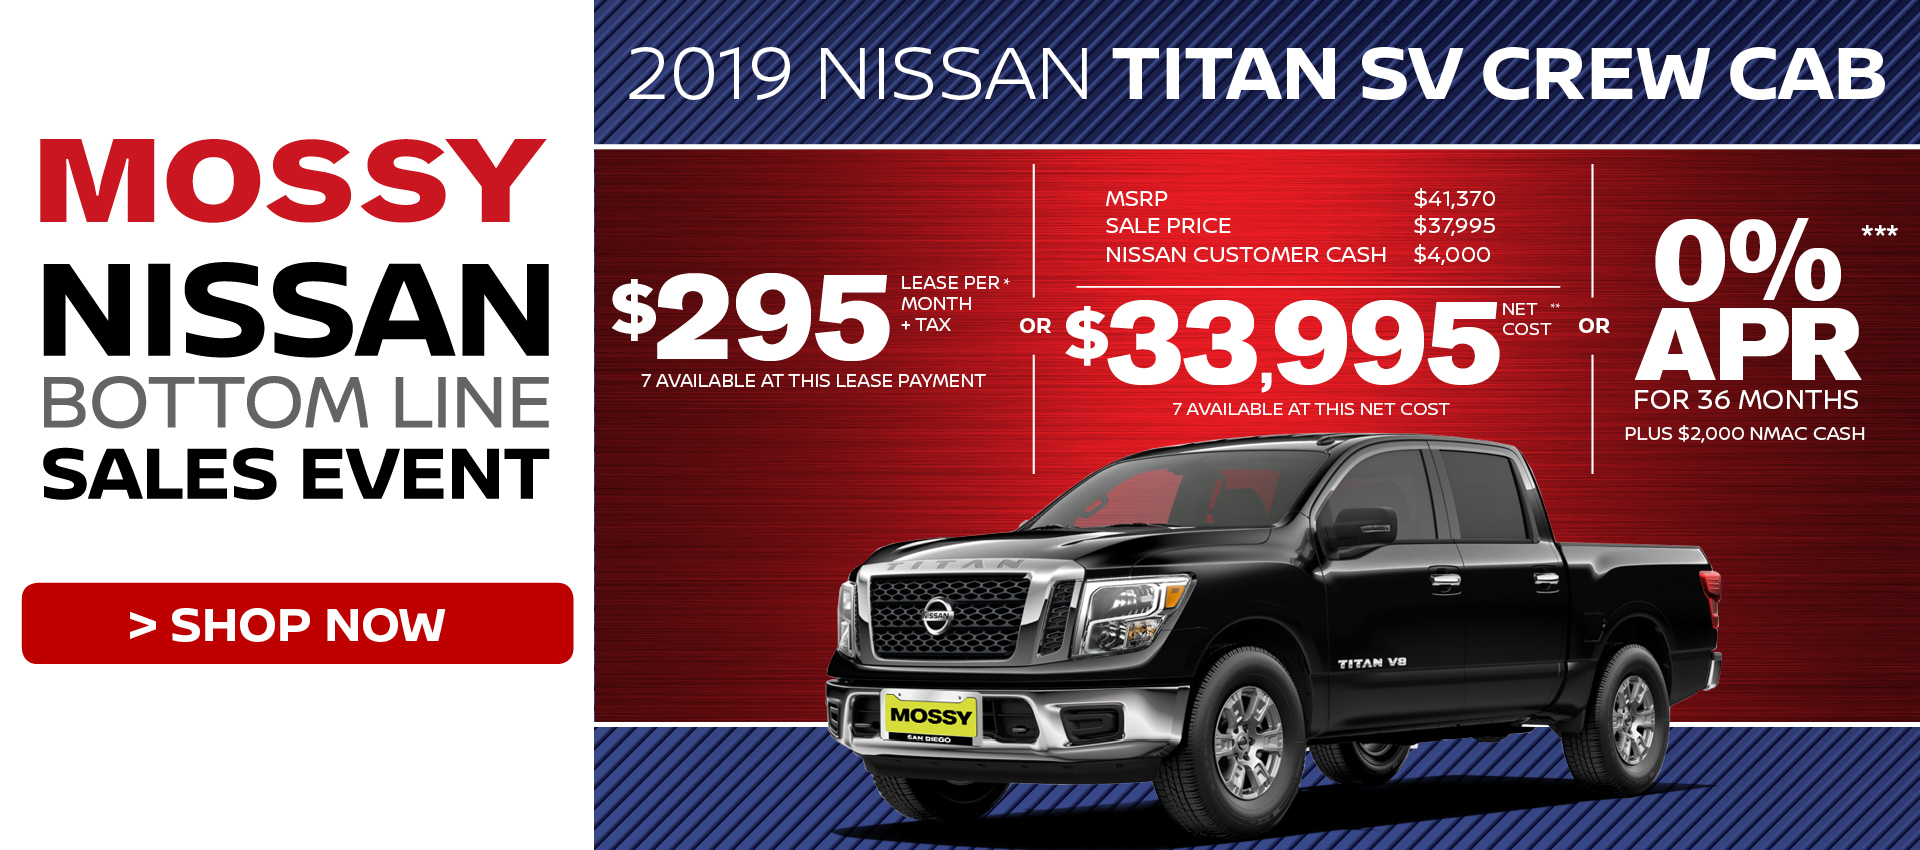 Mossy Nissan - Nissan Titan $33,995 Purchase HP